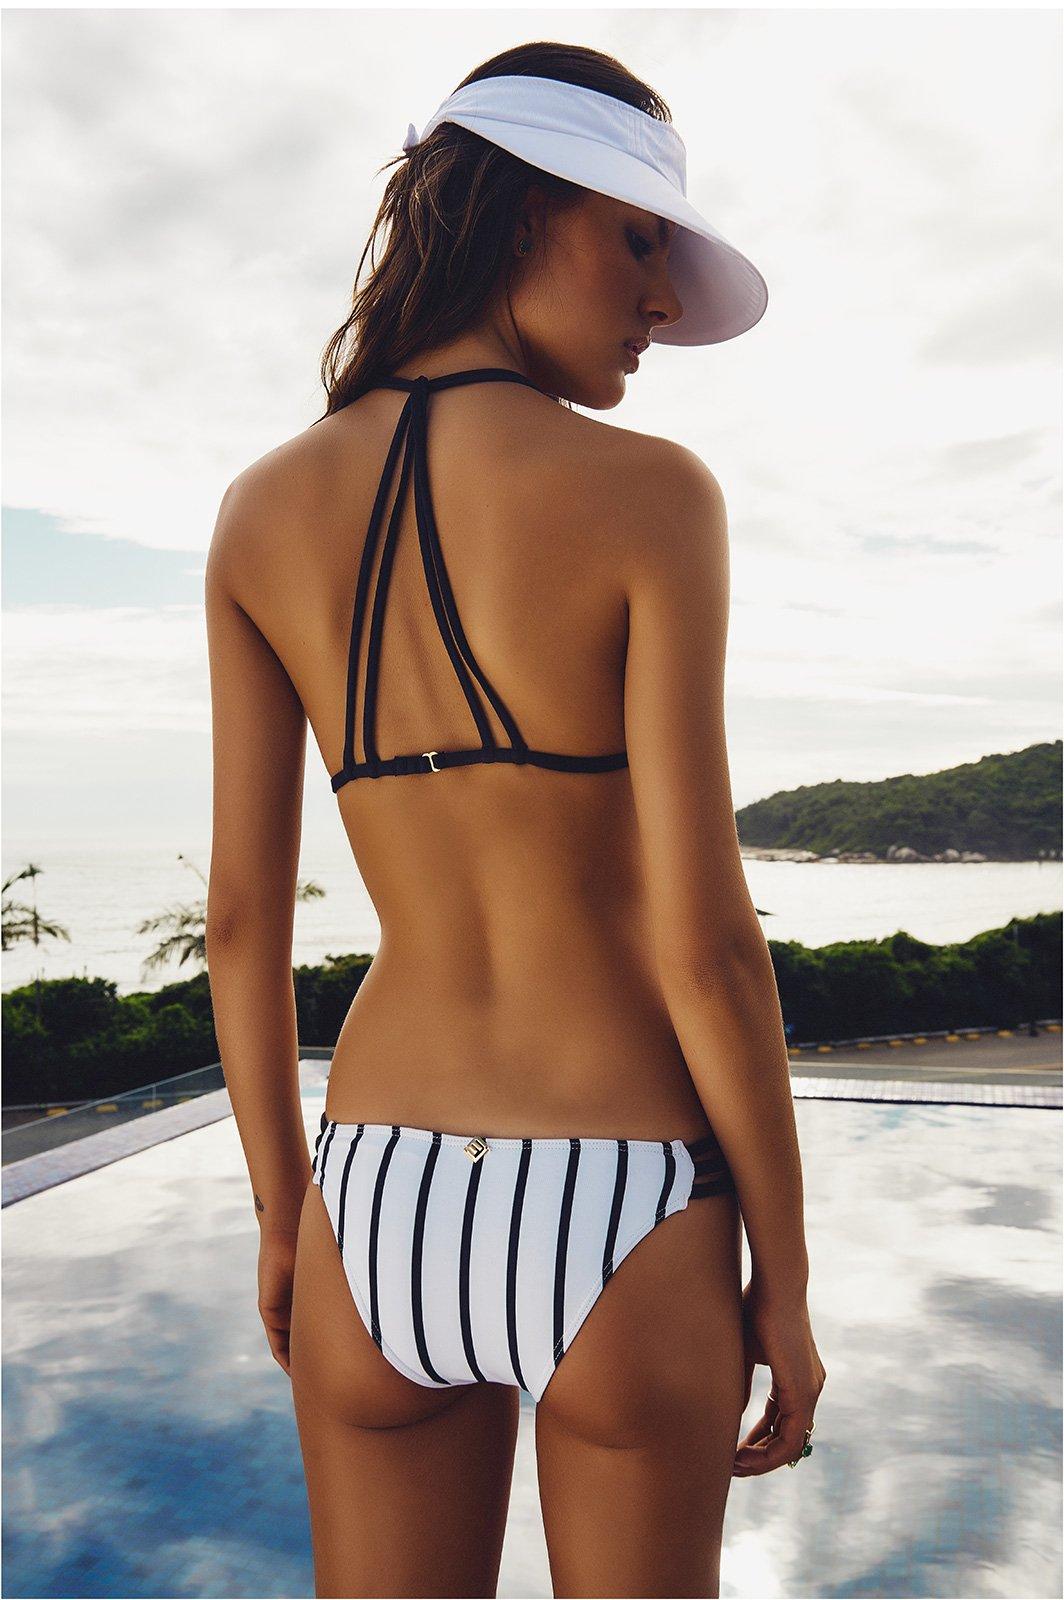 Black And White Striped Bikini